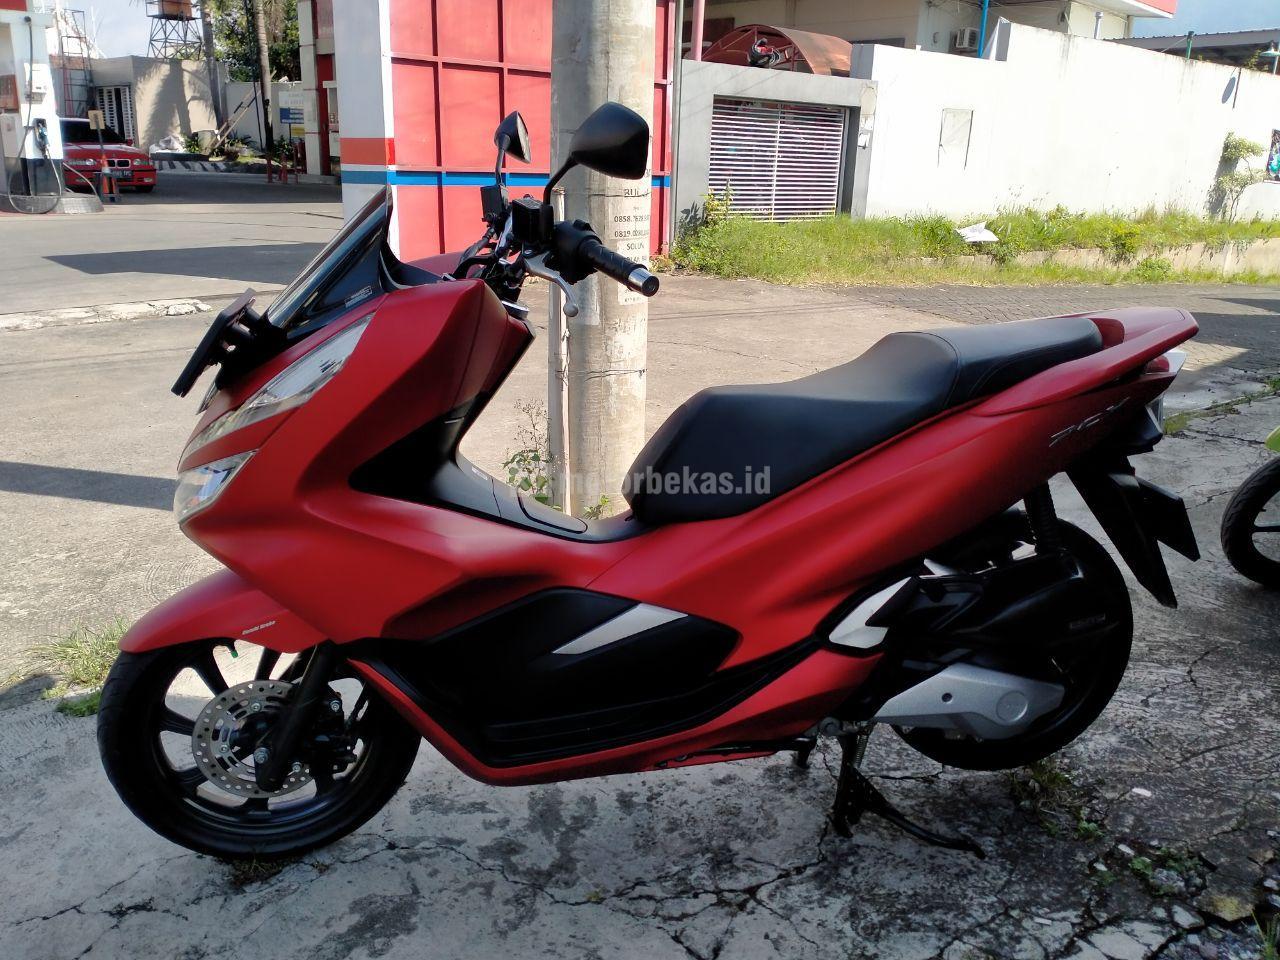 HONDA PCX  3014 motorbekas.id